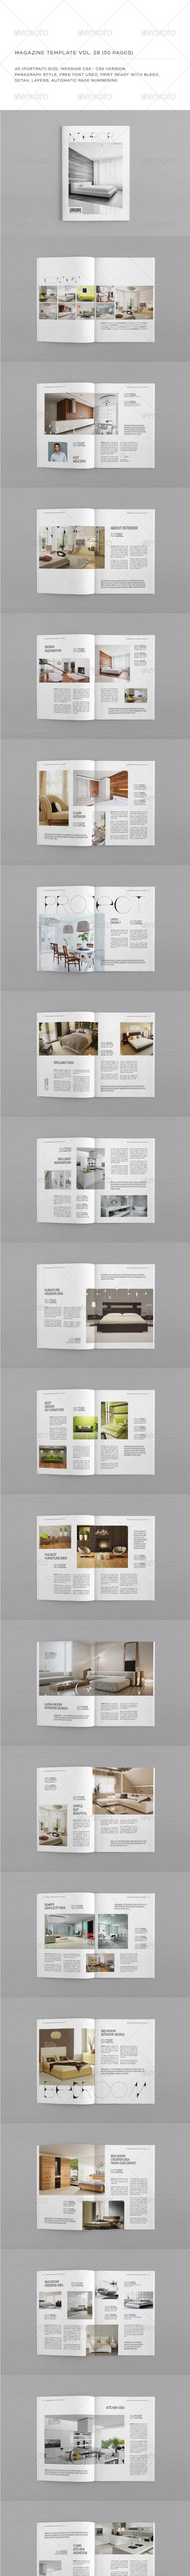 A5 Portrait 50 Pages MGZ (Vol. 28) - Magazines Print Templates